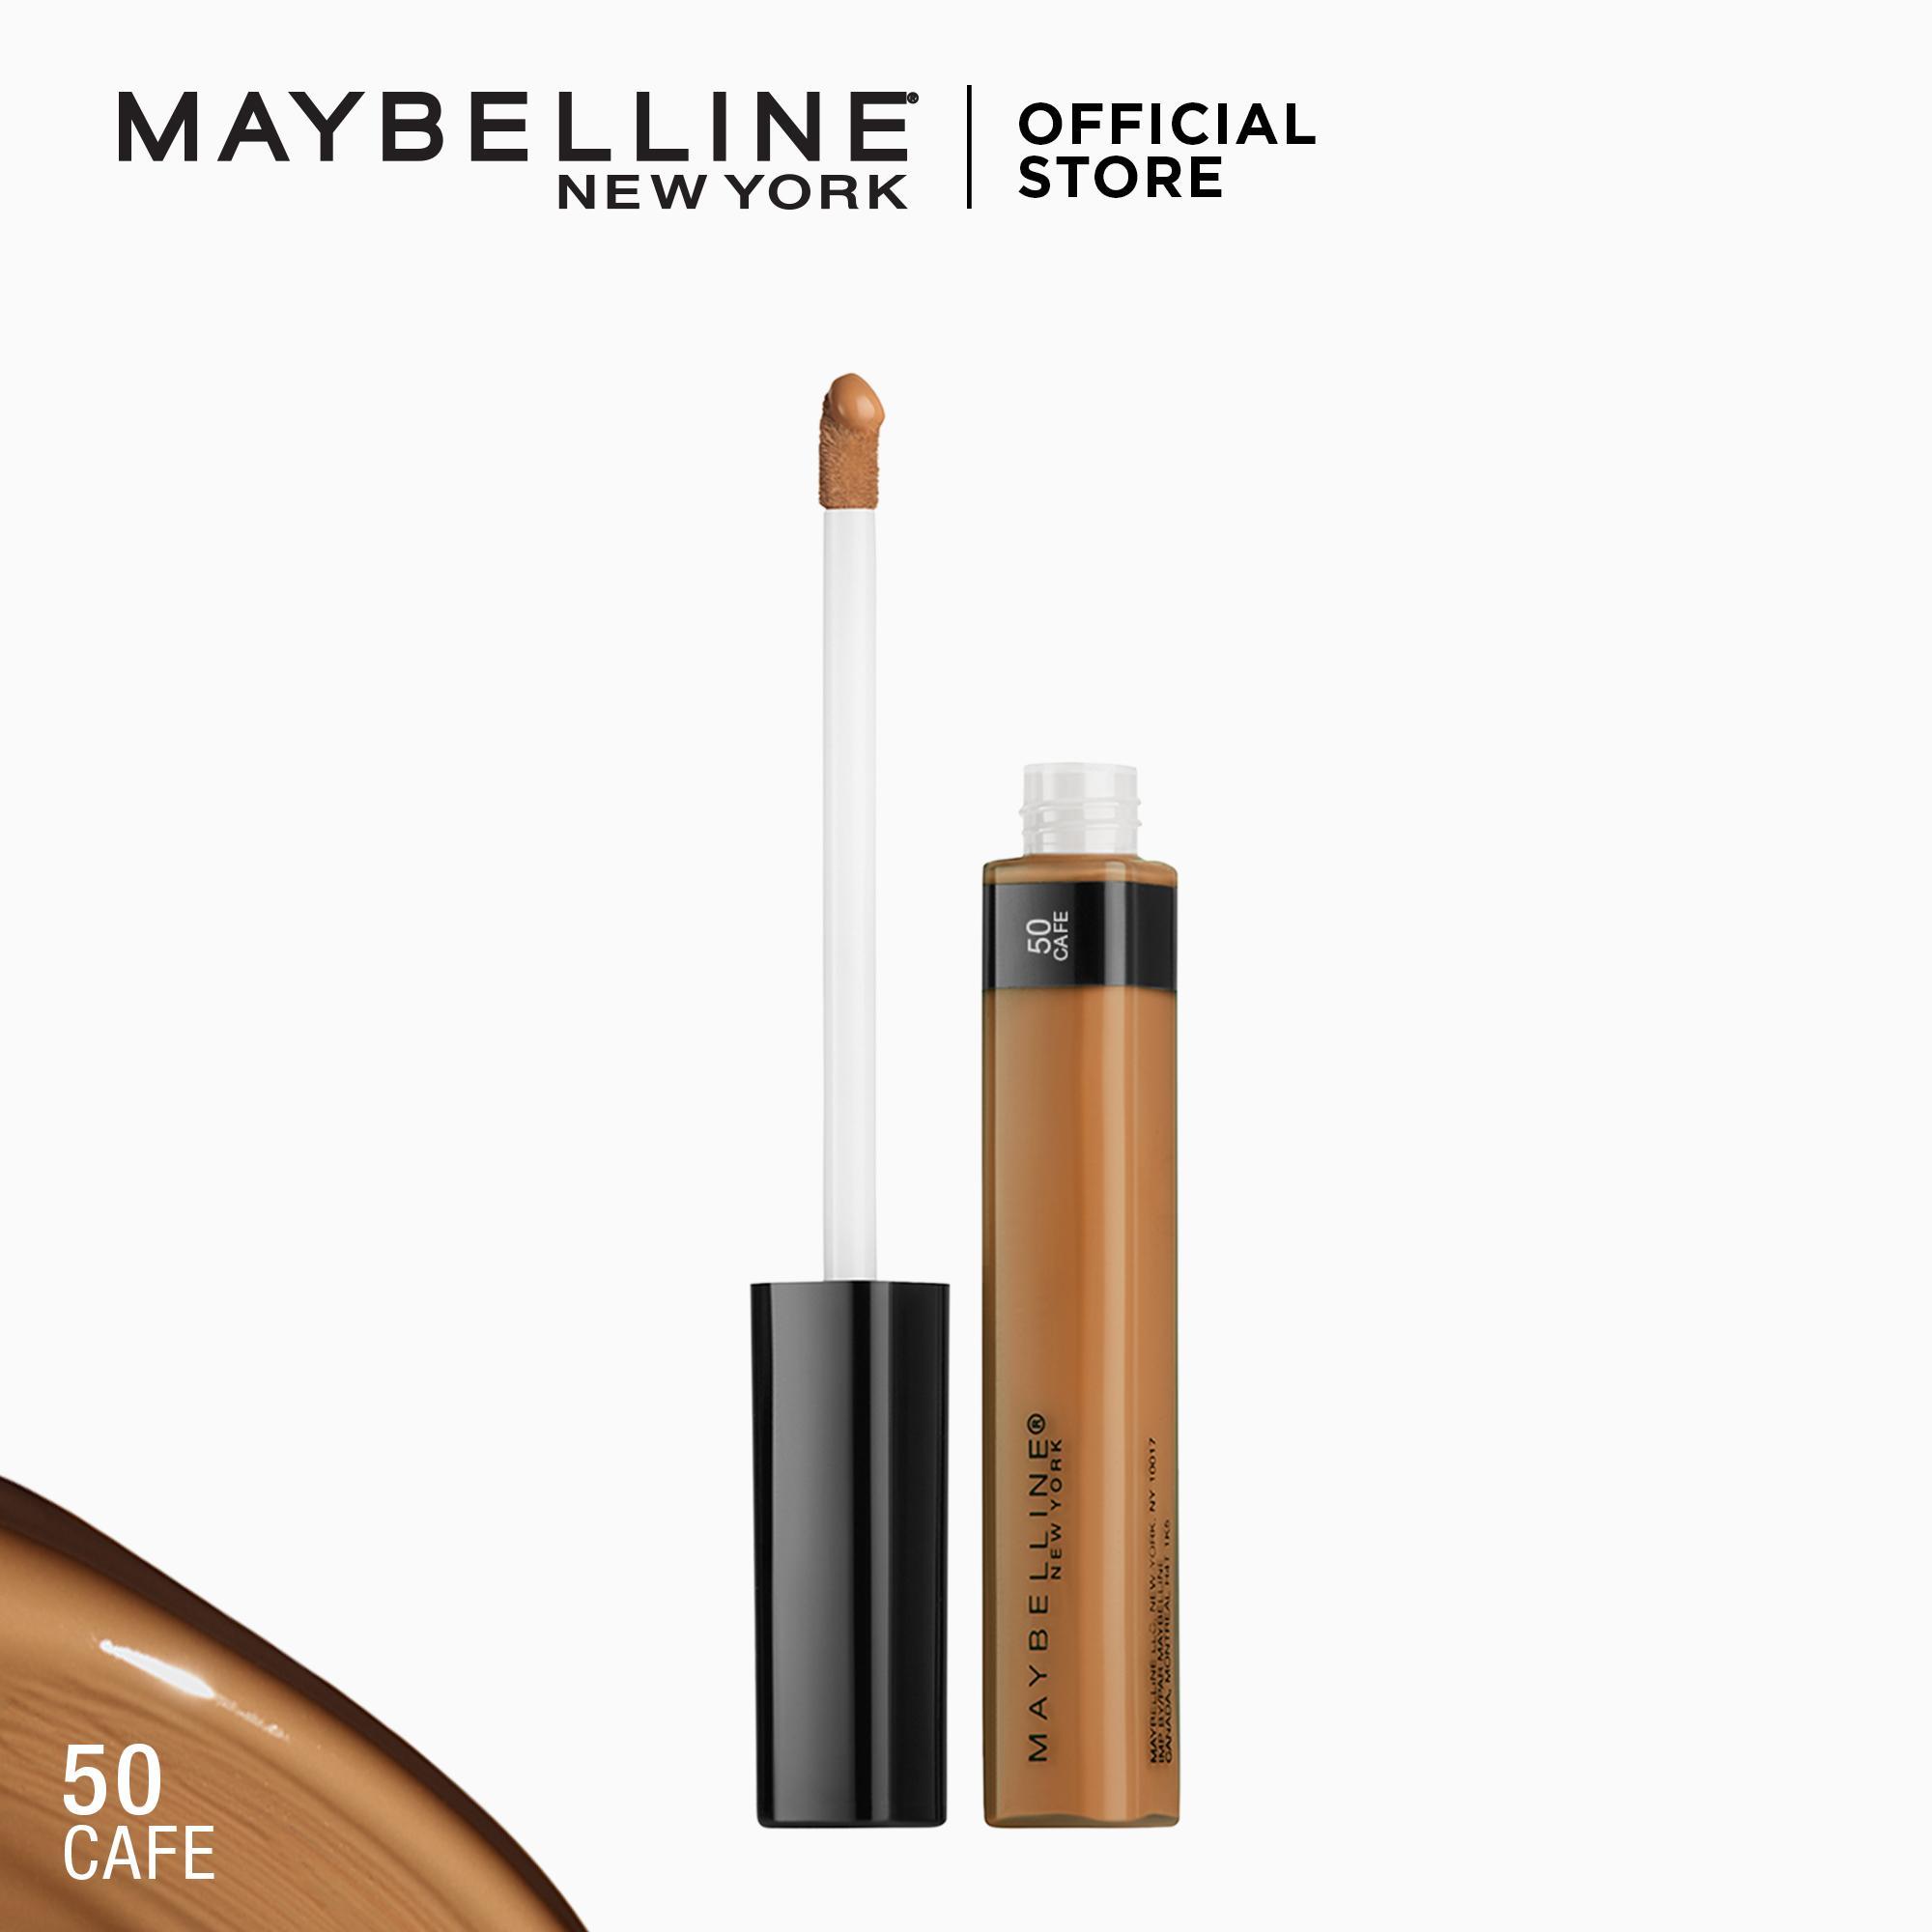 f1d4b0fd38570 Maybelline Philippines: Maybelline price list - Maybelline Lipstick ...